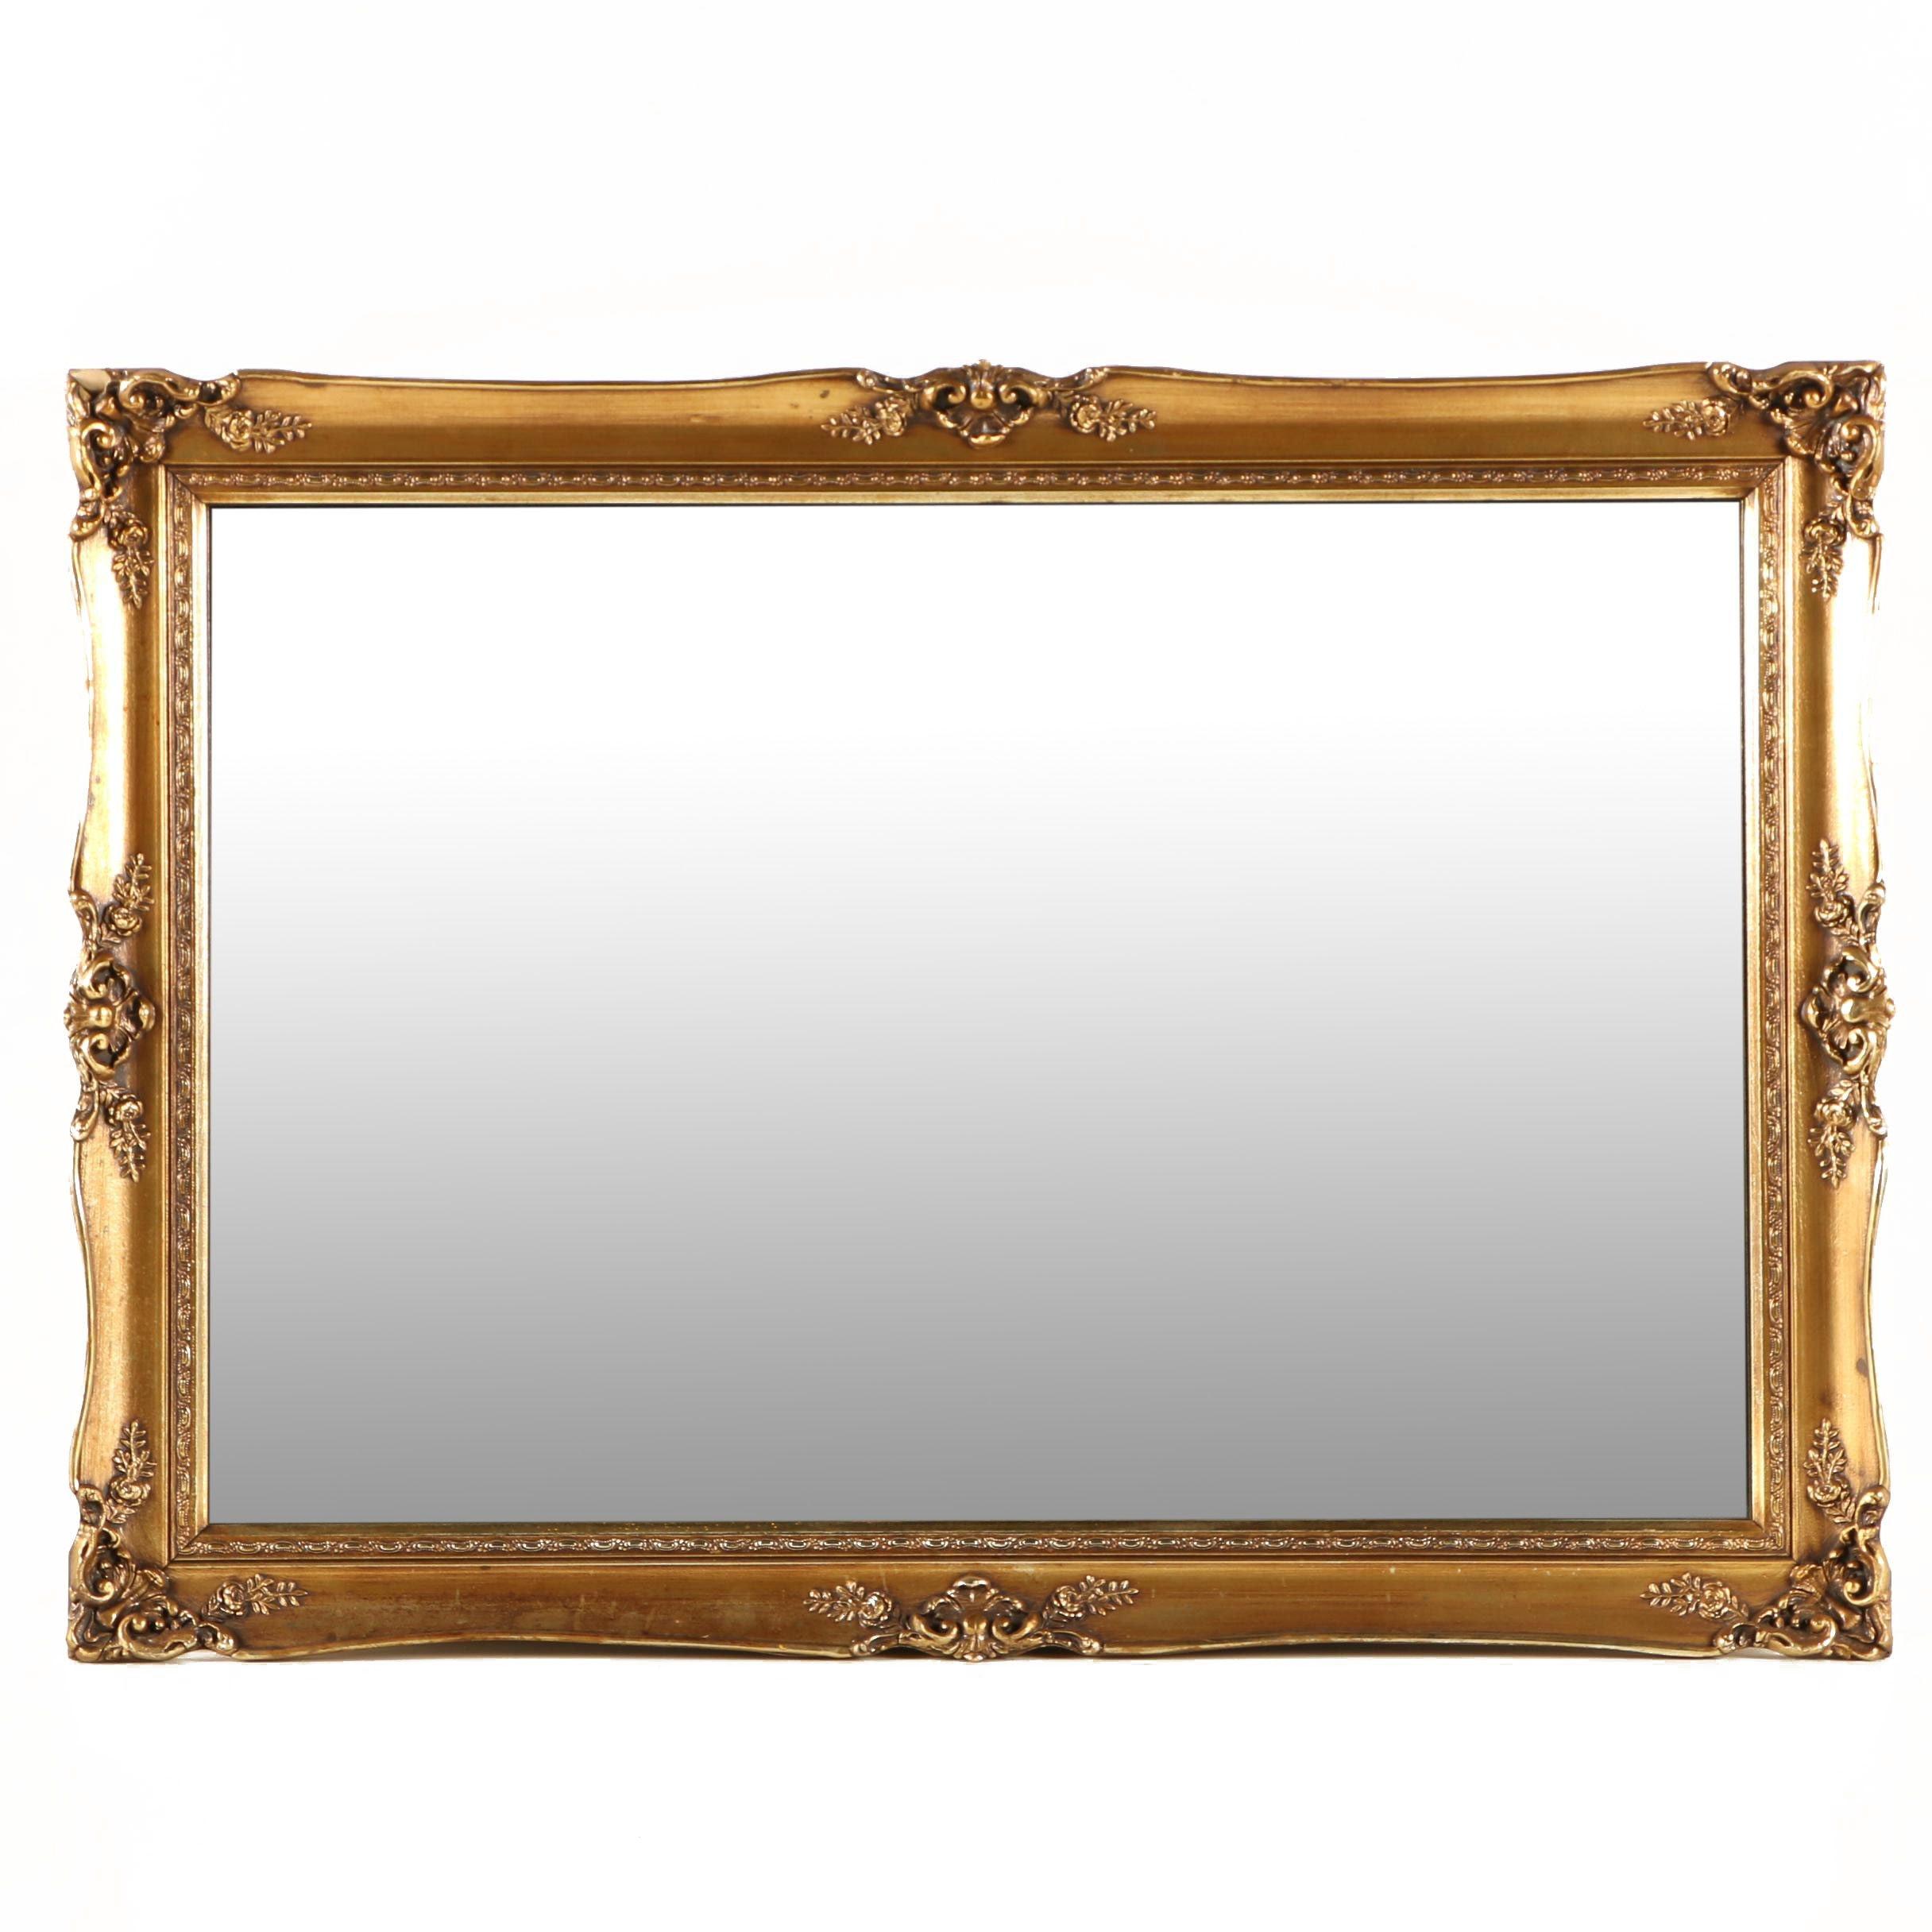 Wall Mirror with Edwardian Style Gilt Frame